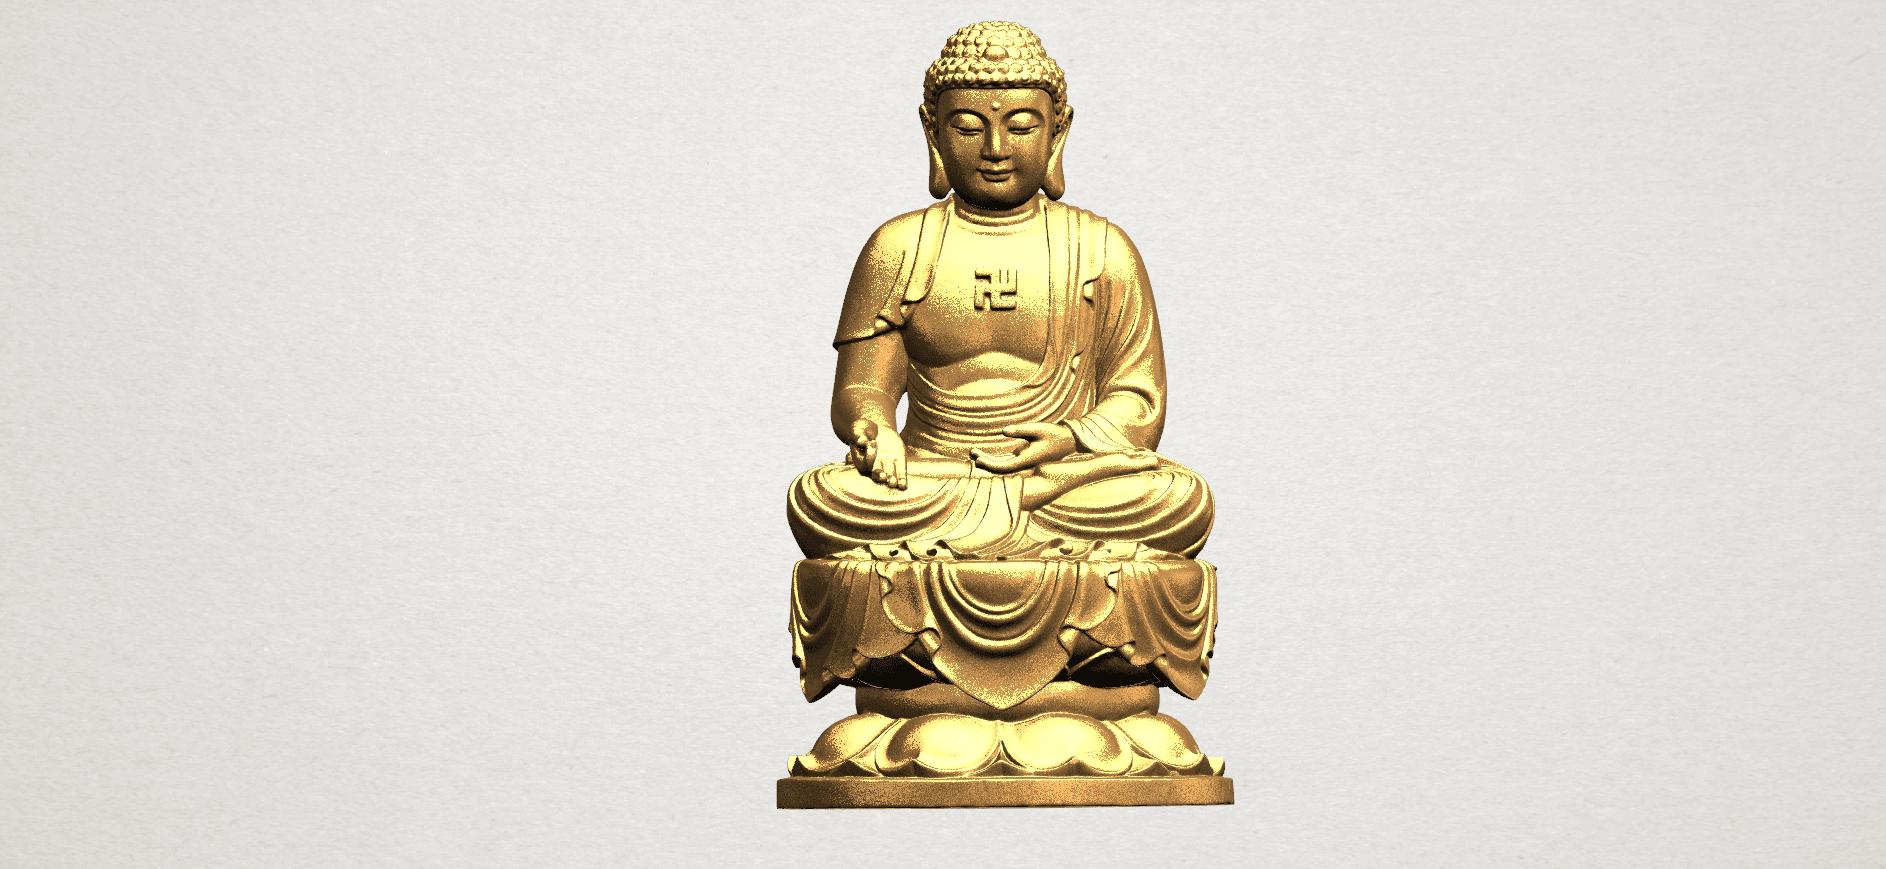 Gautama Buddha (ii) A01.png Download free STL file Gautama Buddha 02 • 3D print template, GeorgesNikkei